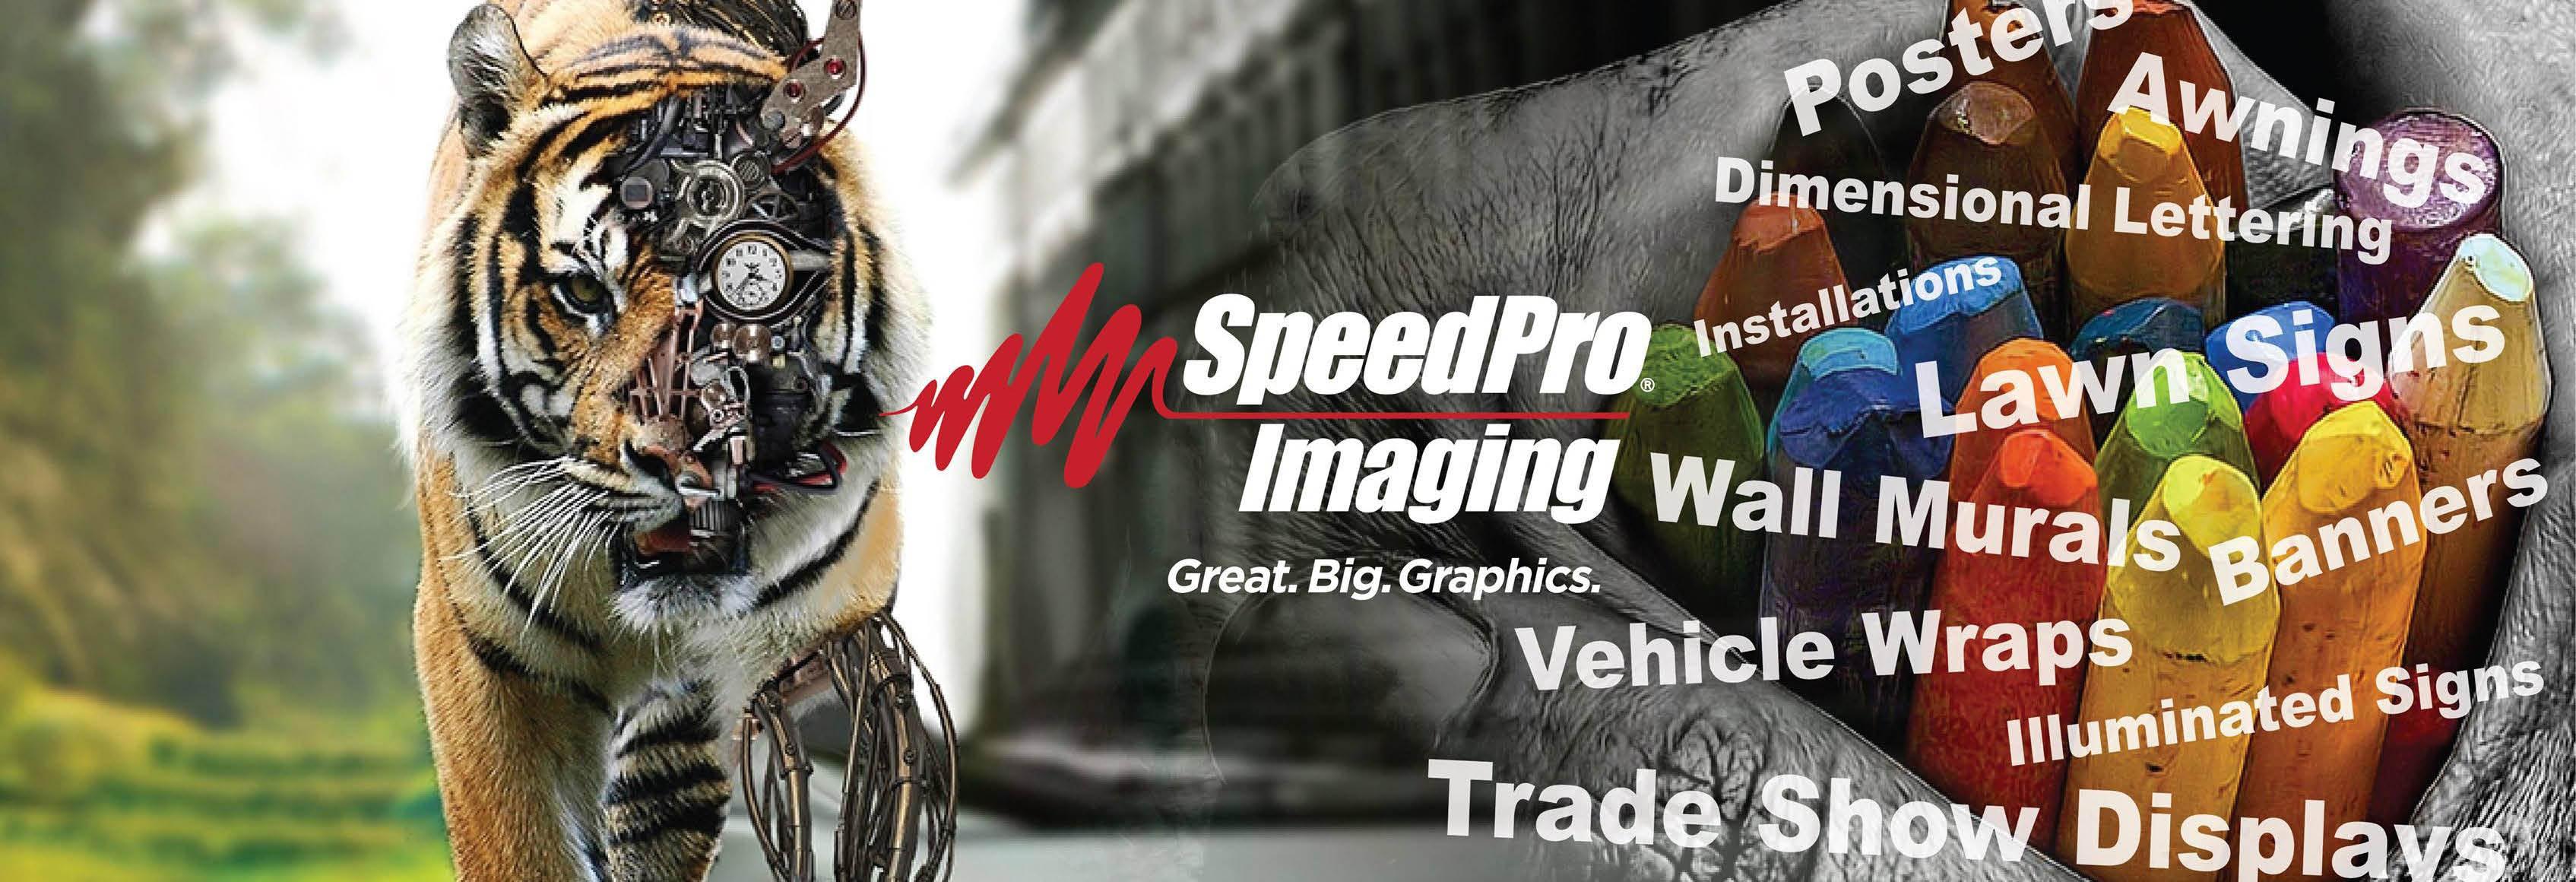 Speedpro Imaging NJ - Speedpro Rahway, NJ